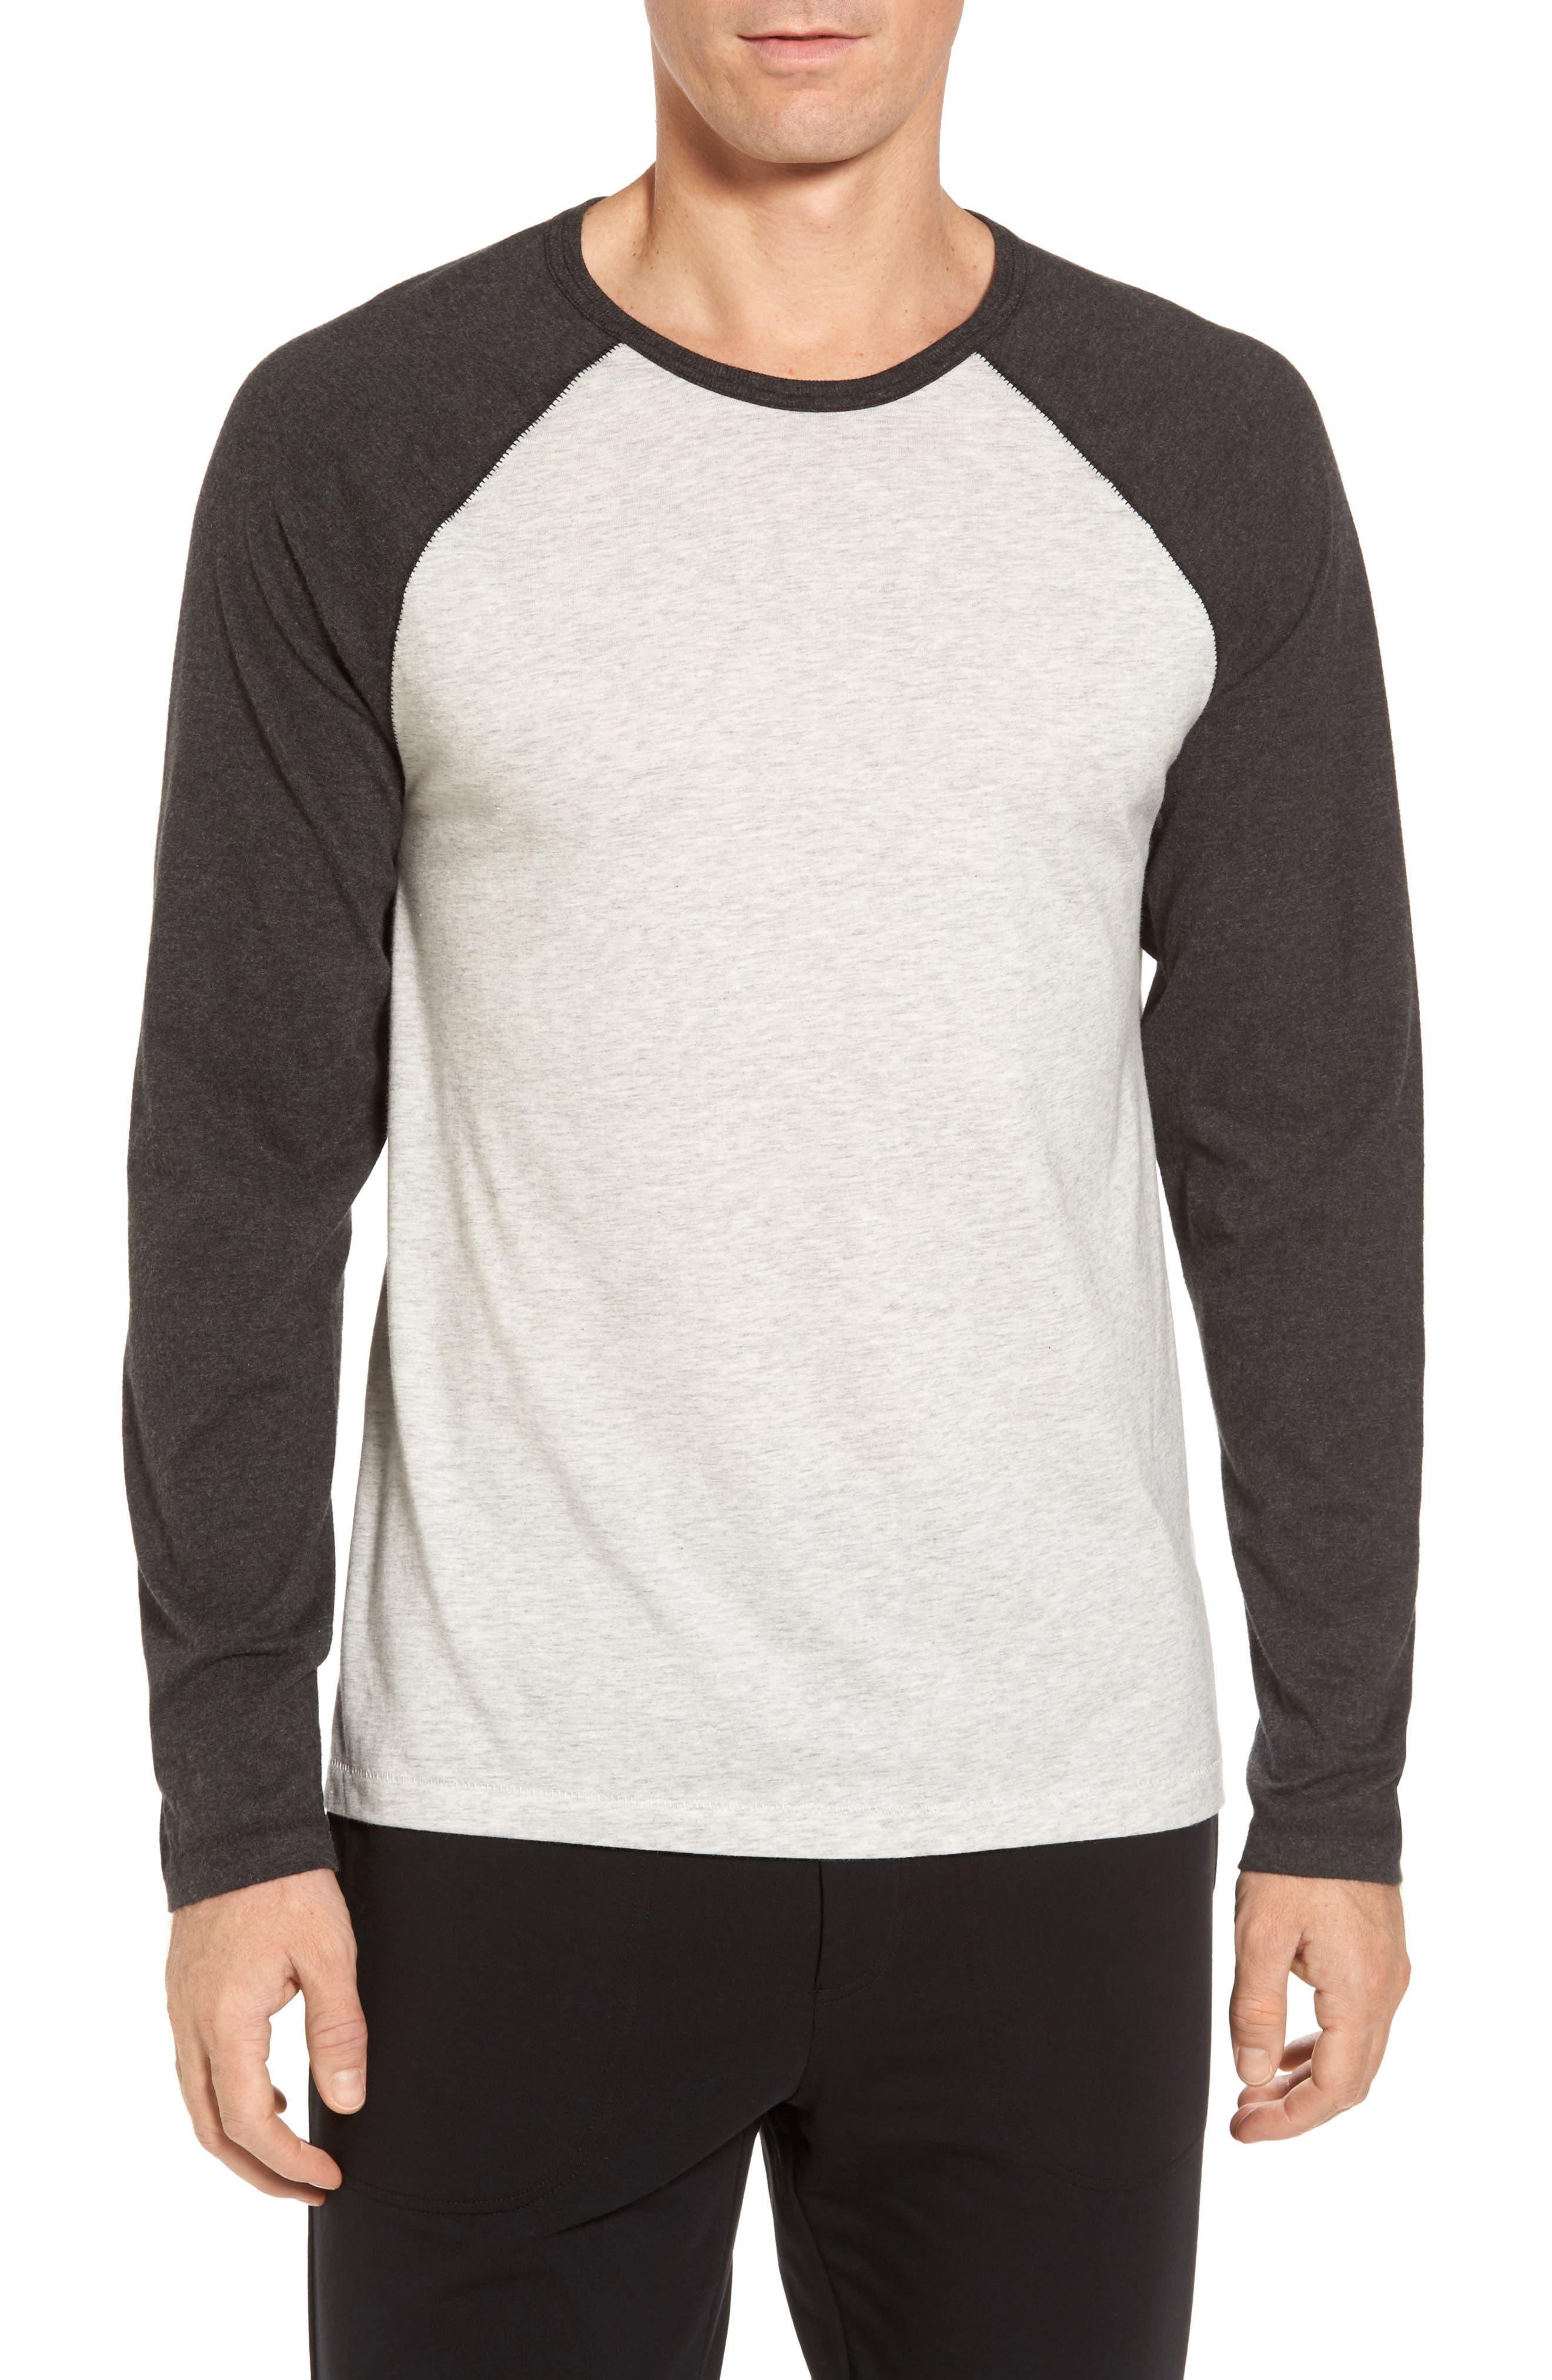 Stefan Raglan T-Shirt,                             Main thumbnail 1, color,                             024